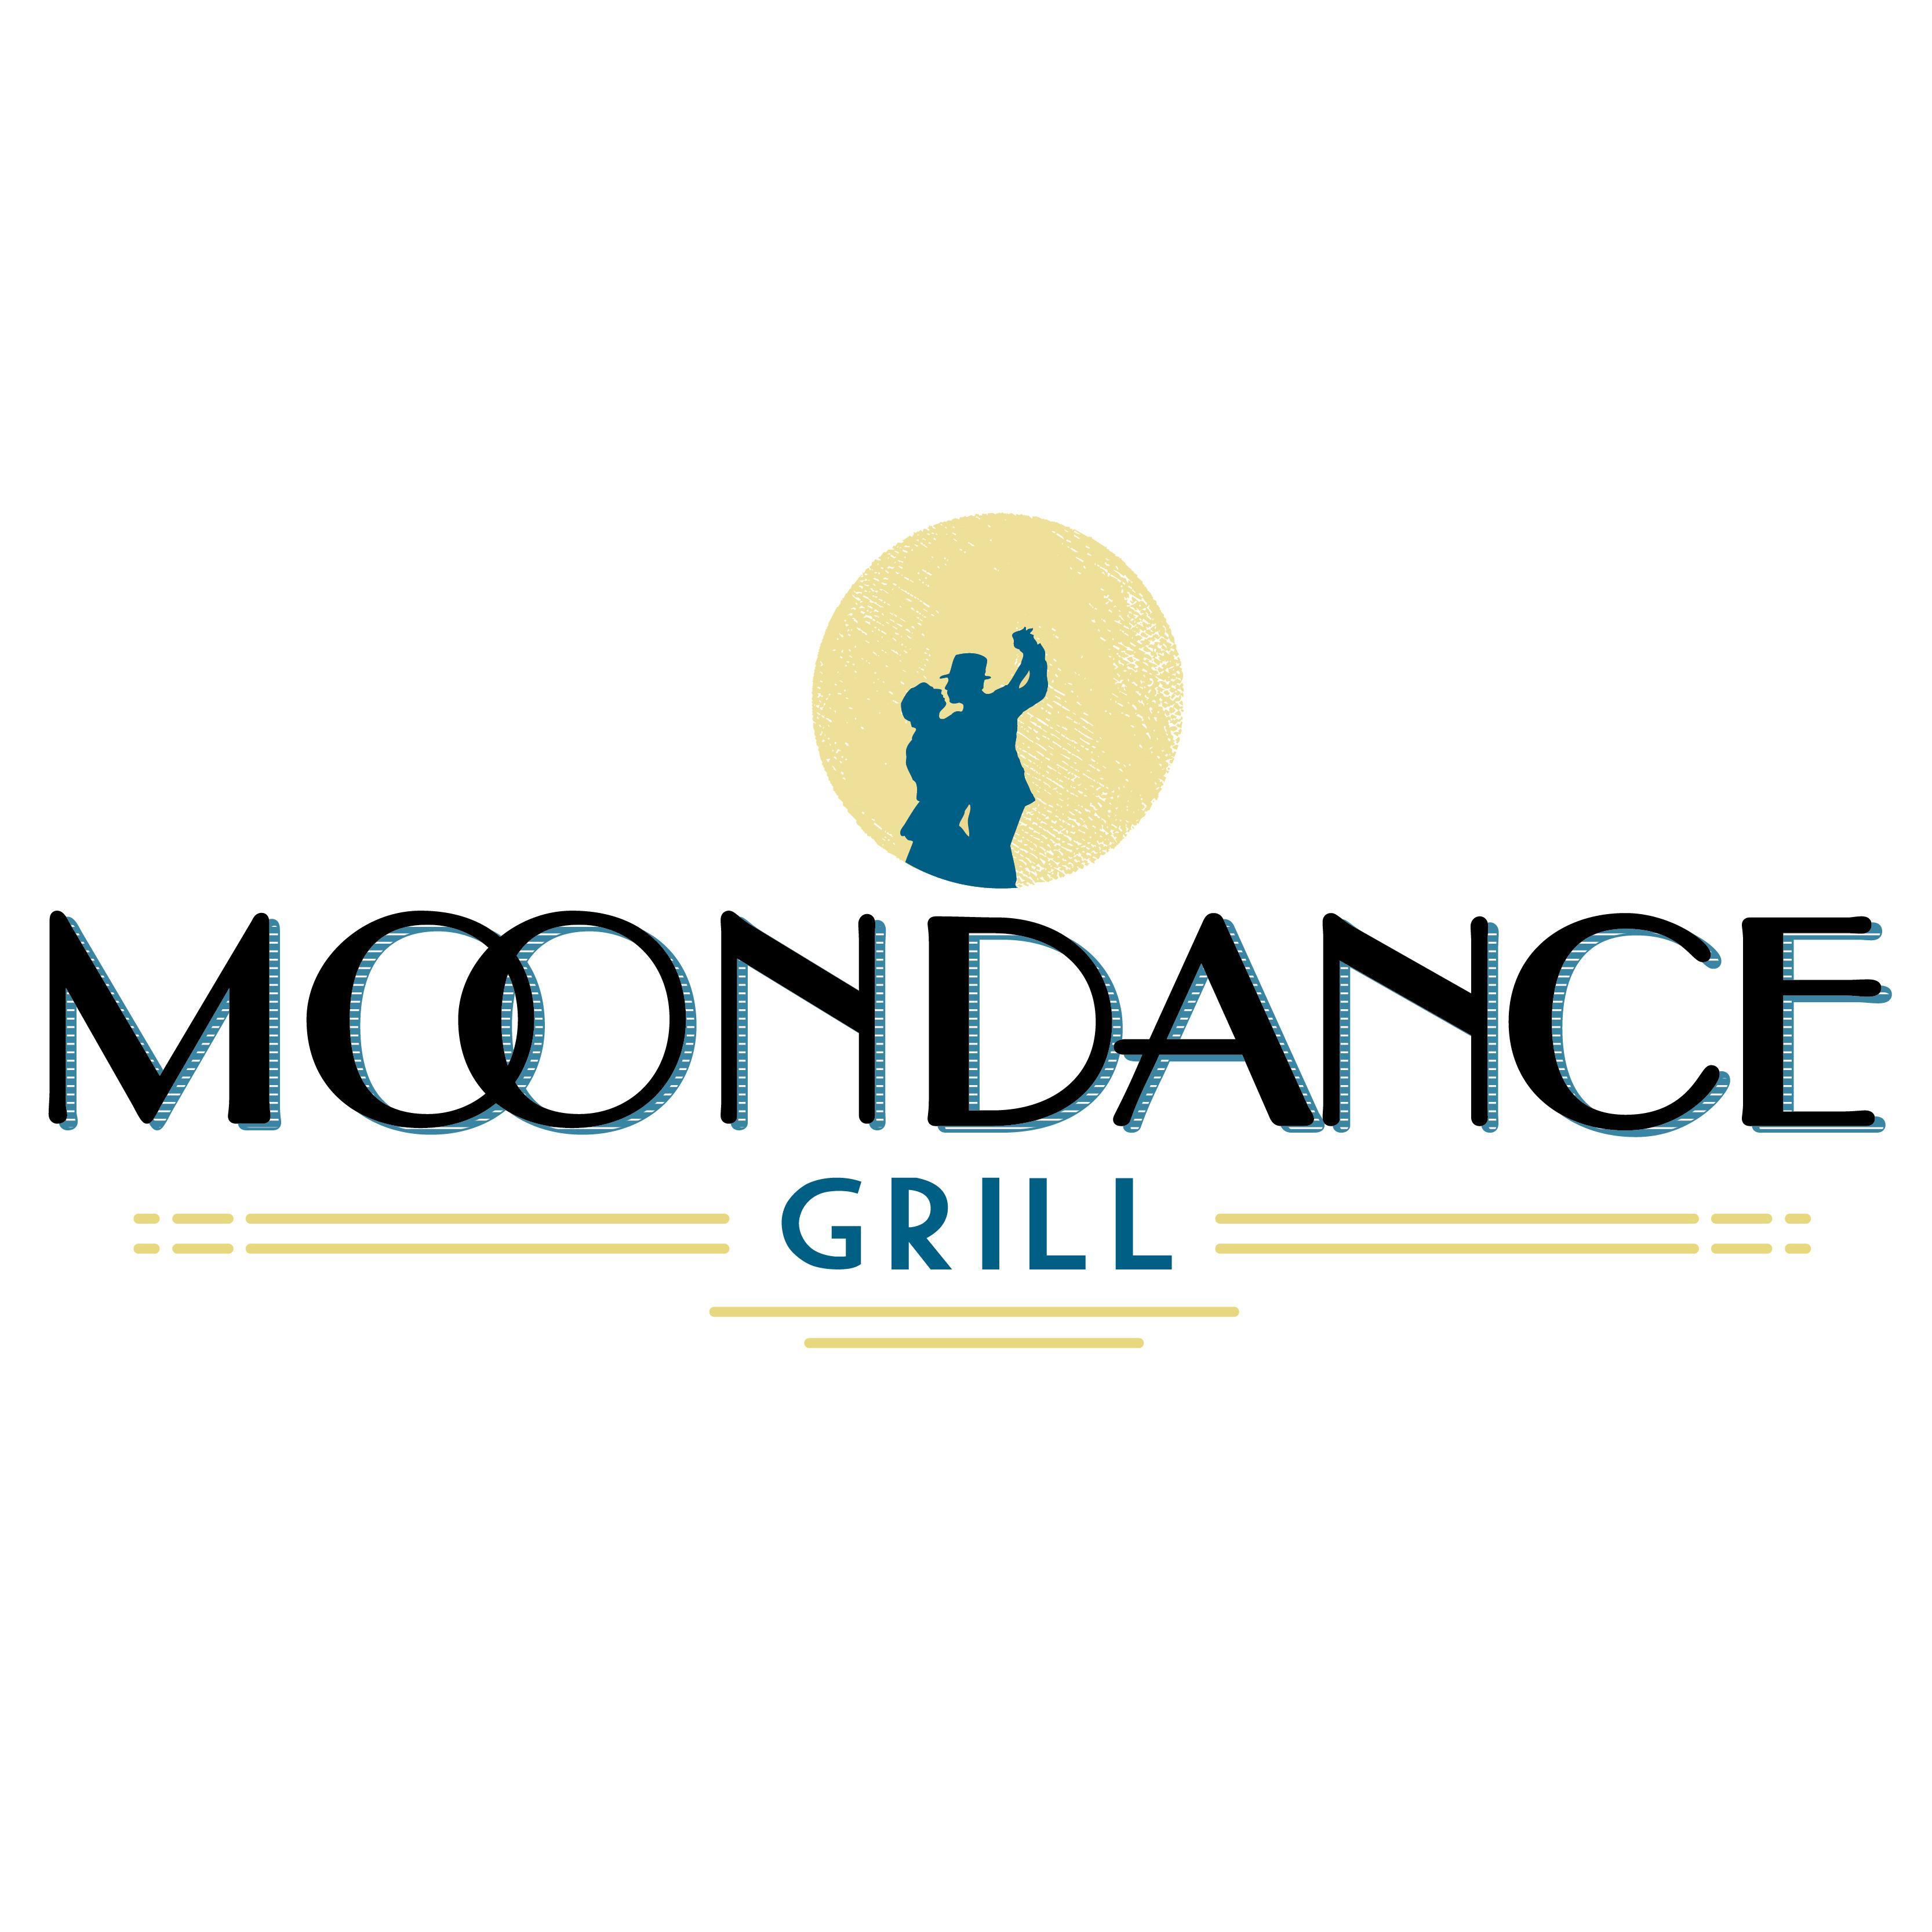 moondance grill - Germantown, TN 38138 - (901)755-1471   ShowMeLocal.com